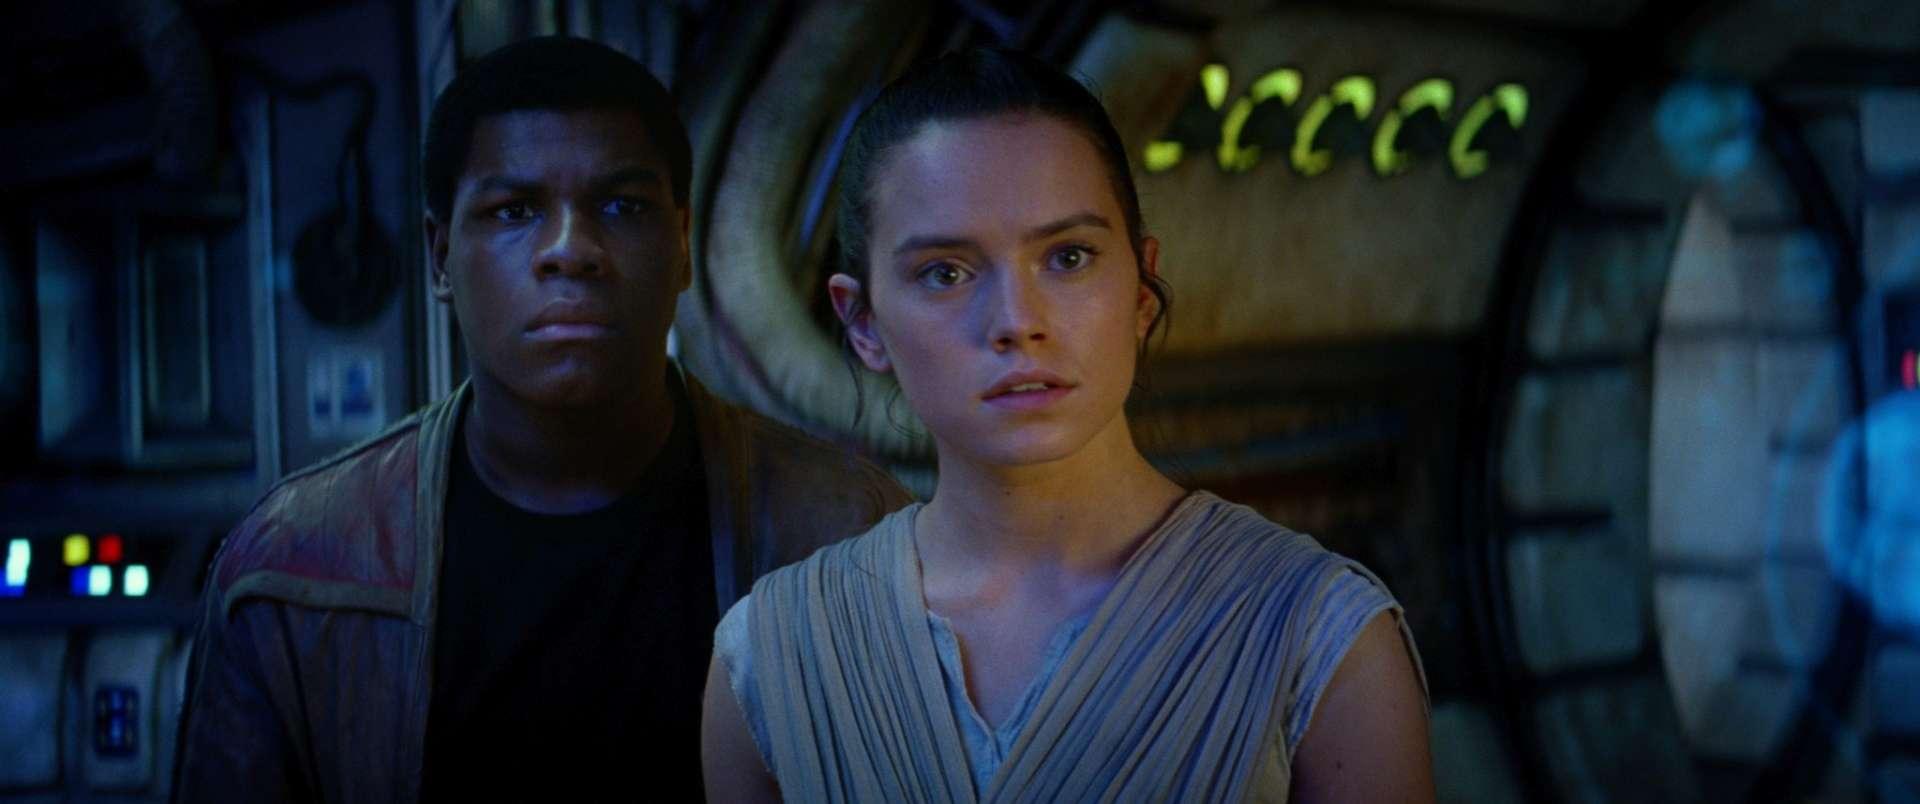 Star Wars Episode VII The Force Awakens Wallpaper 052